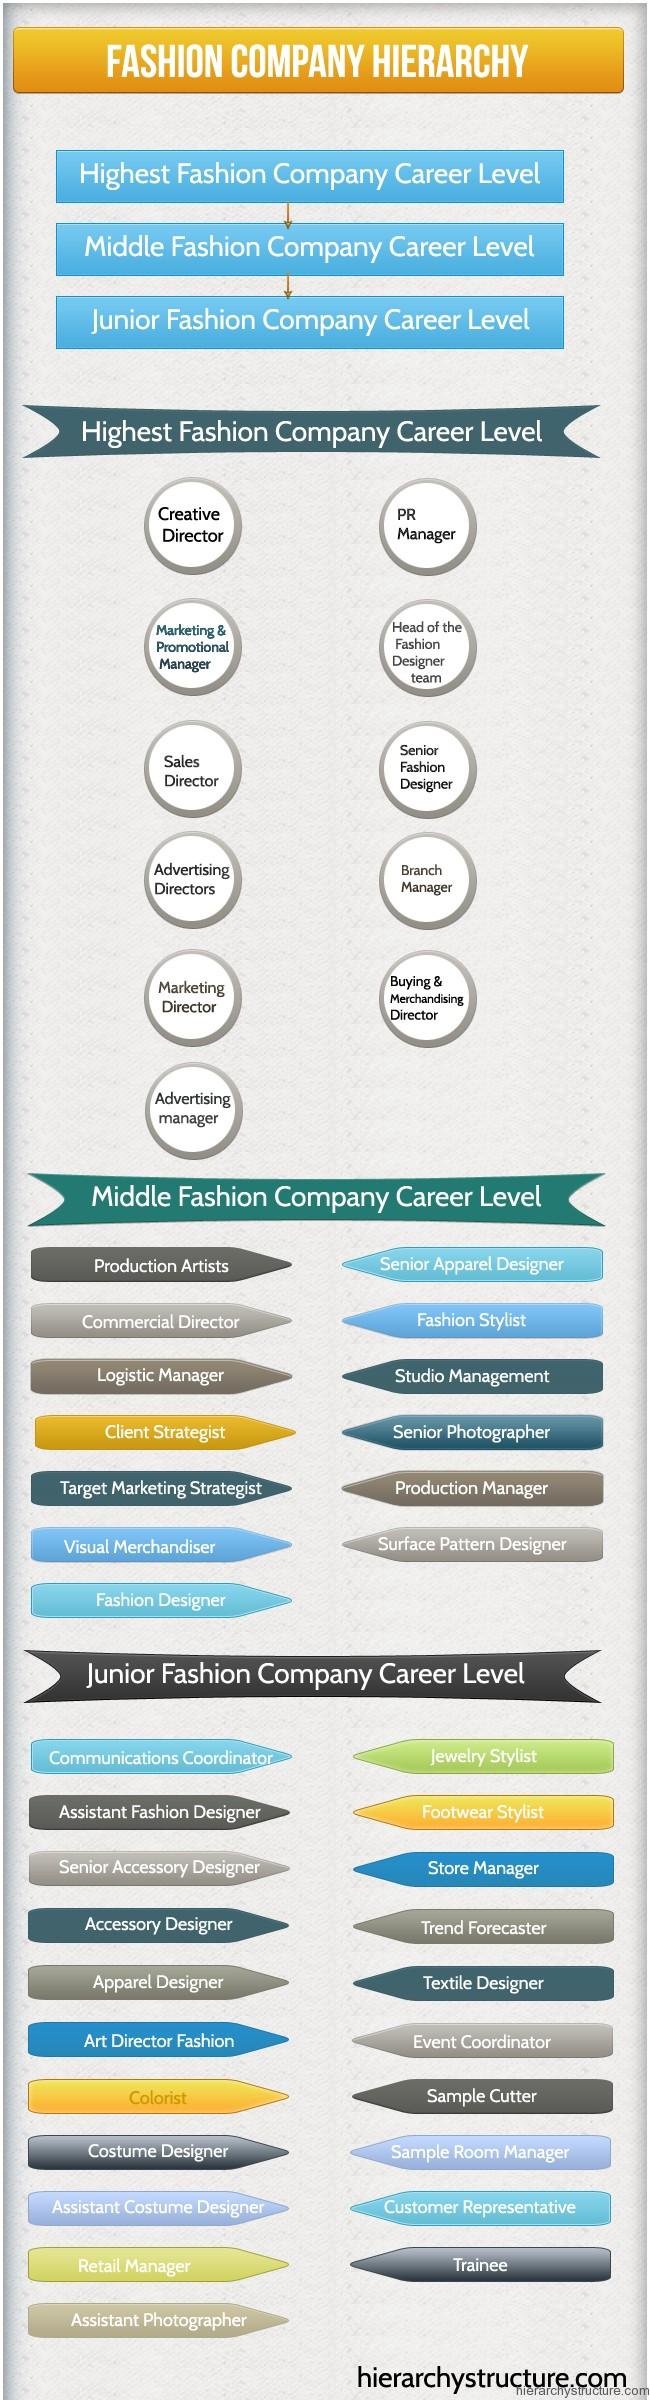 Fashion Company Hierarchy